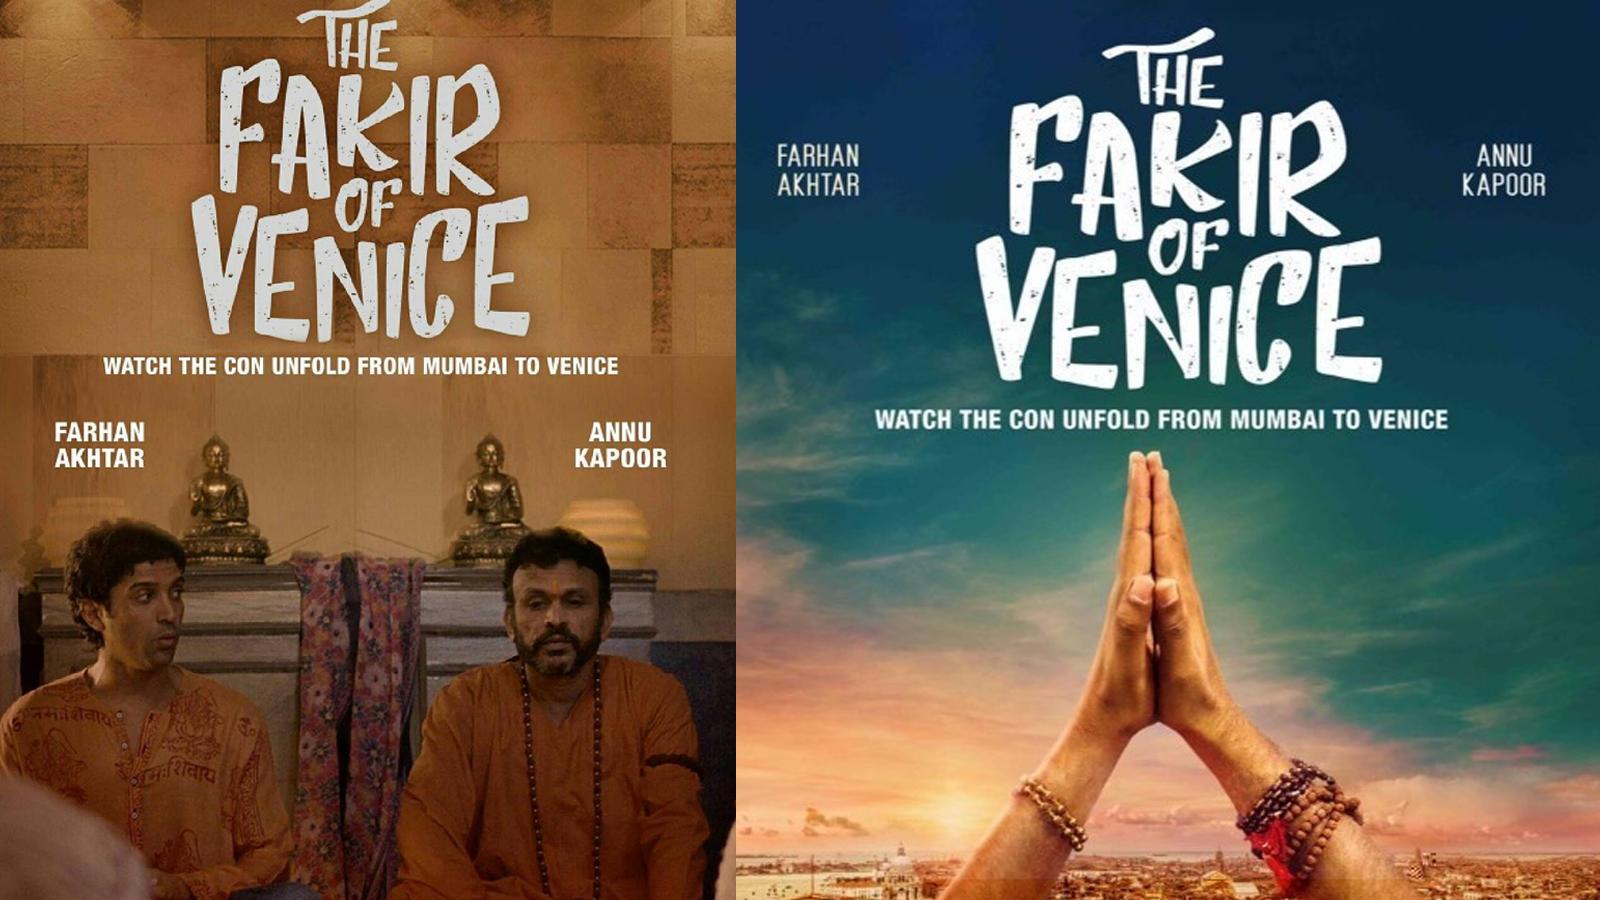 Release of Farhan Akhtar's 'The Fakir of Venice' postponed again